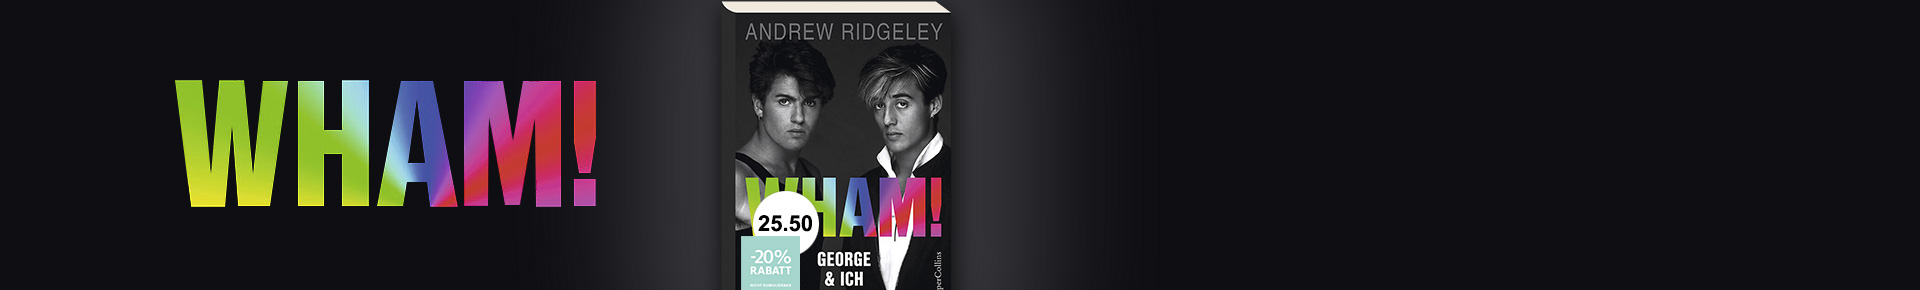 Wham! – George & ich